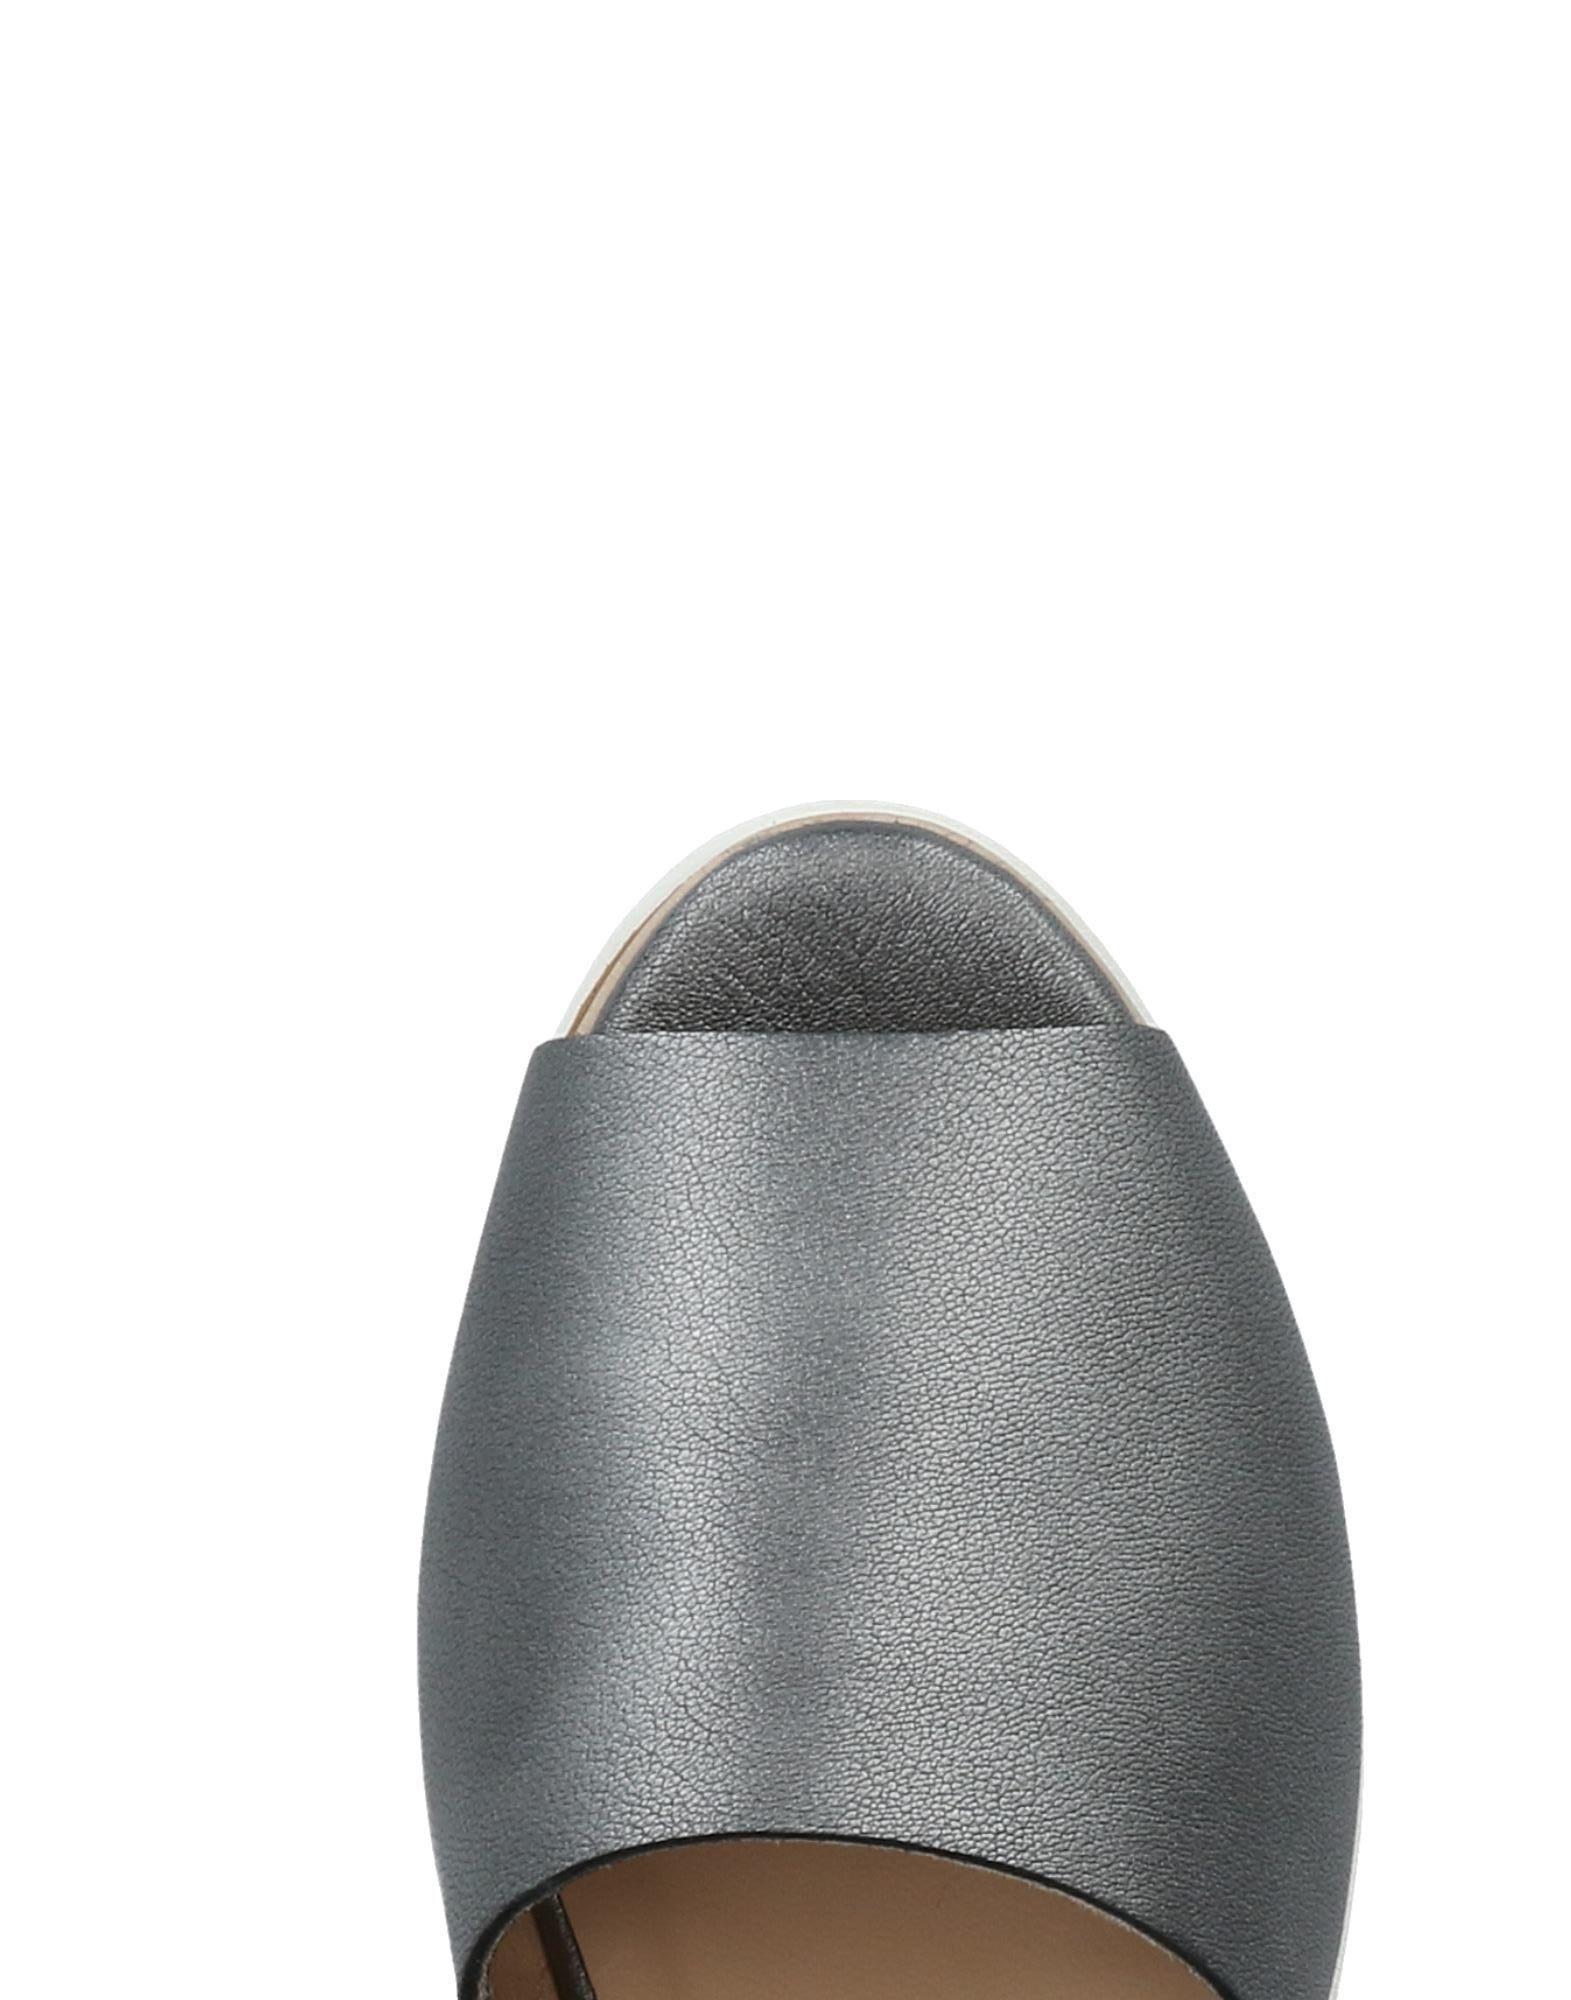 Sandales Peperosa Femme - Sandales Peperosa sur